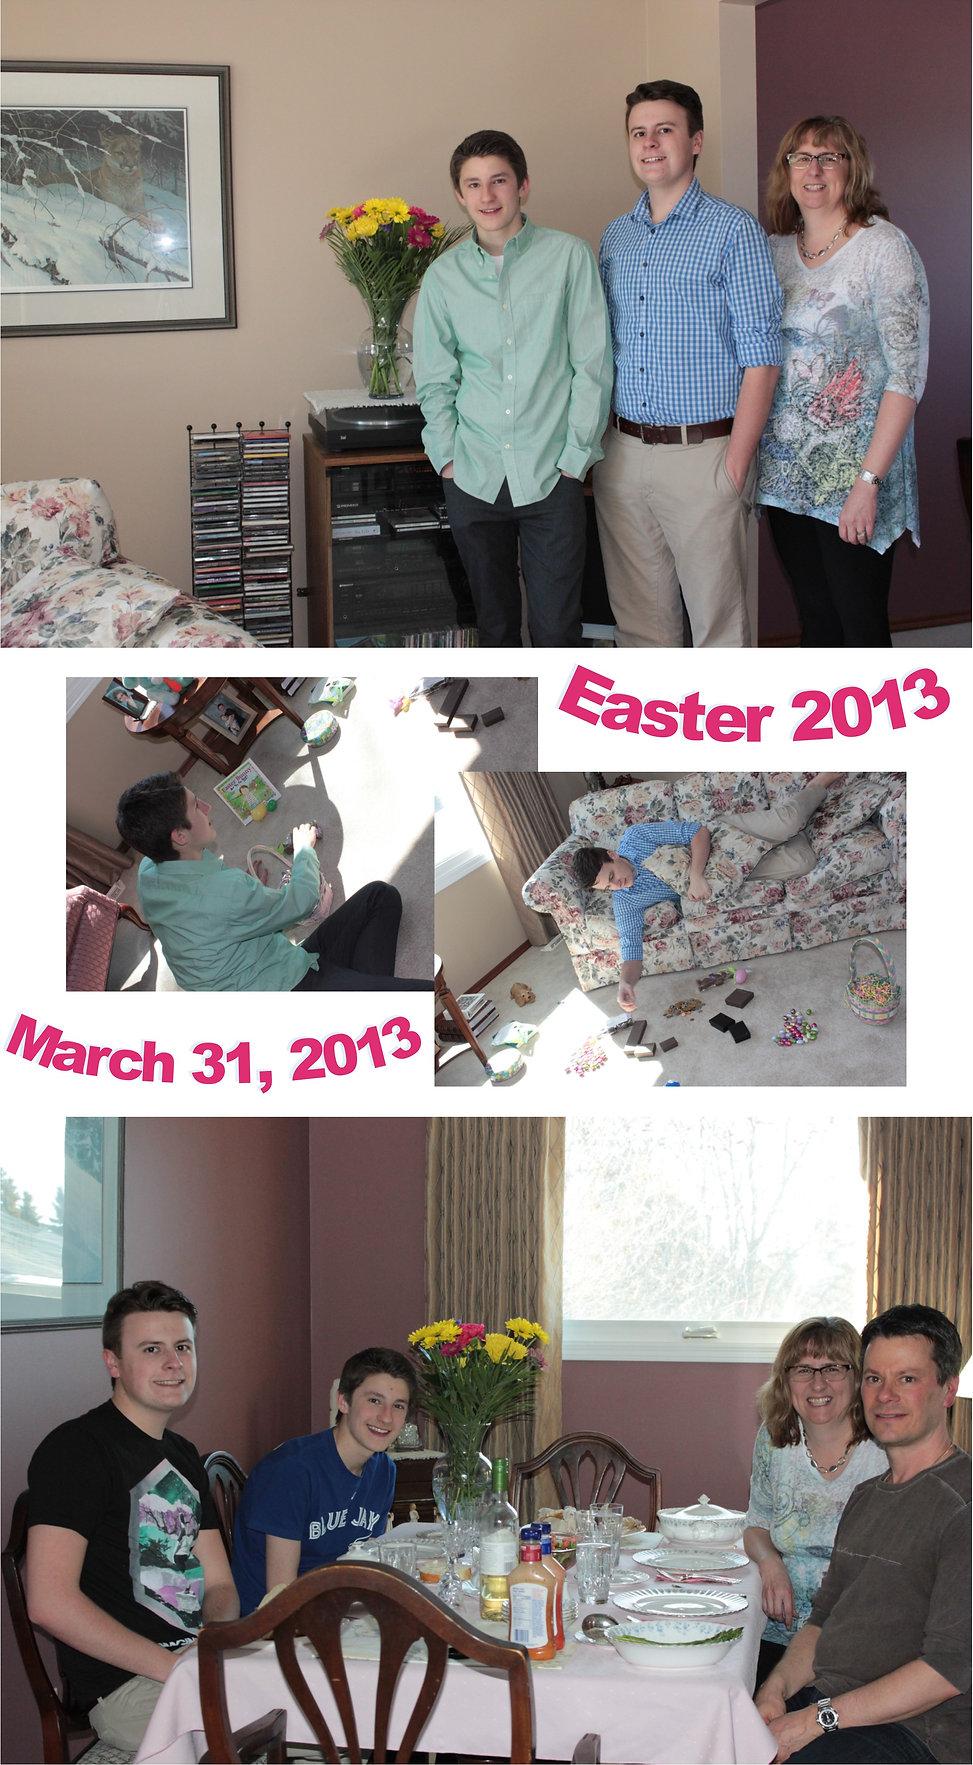 Easter 2013 collage.jpg